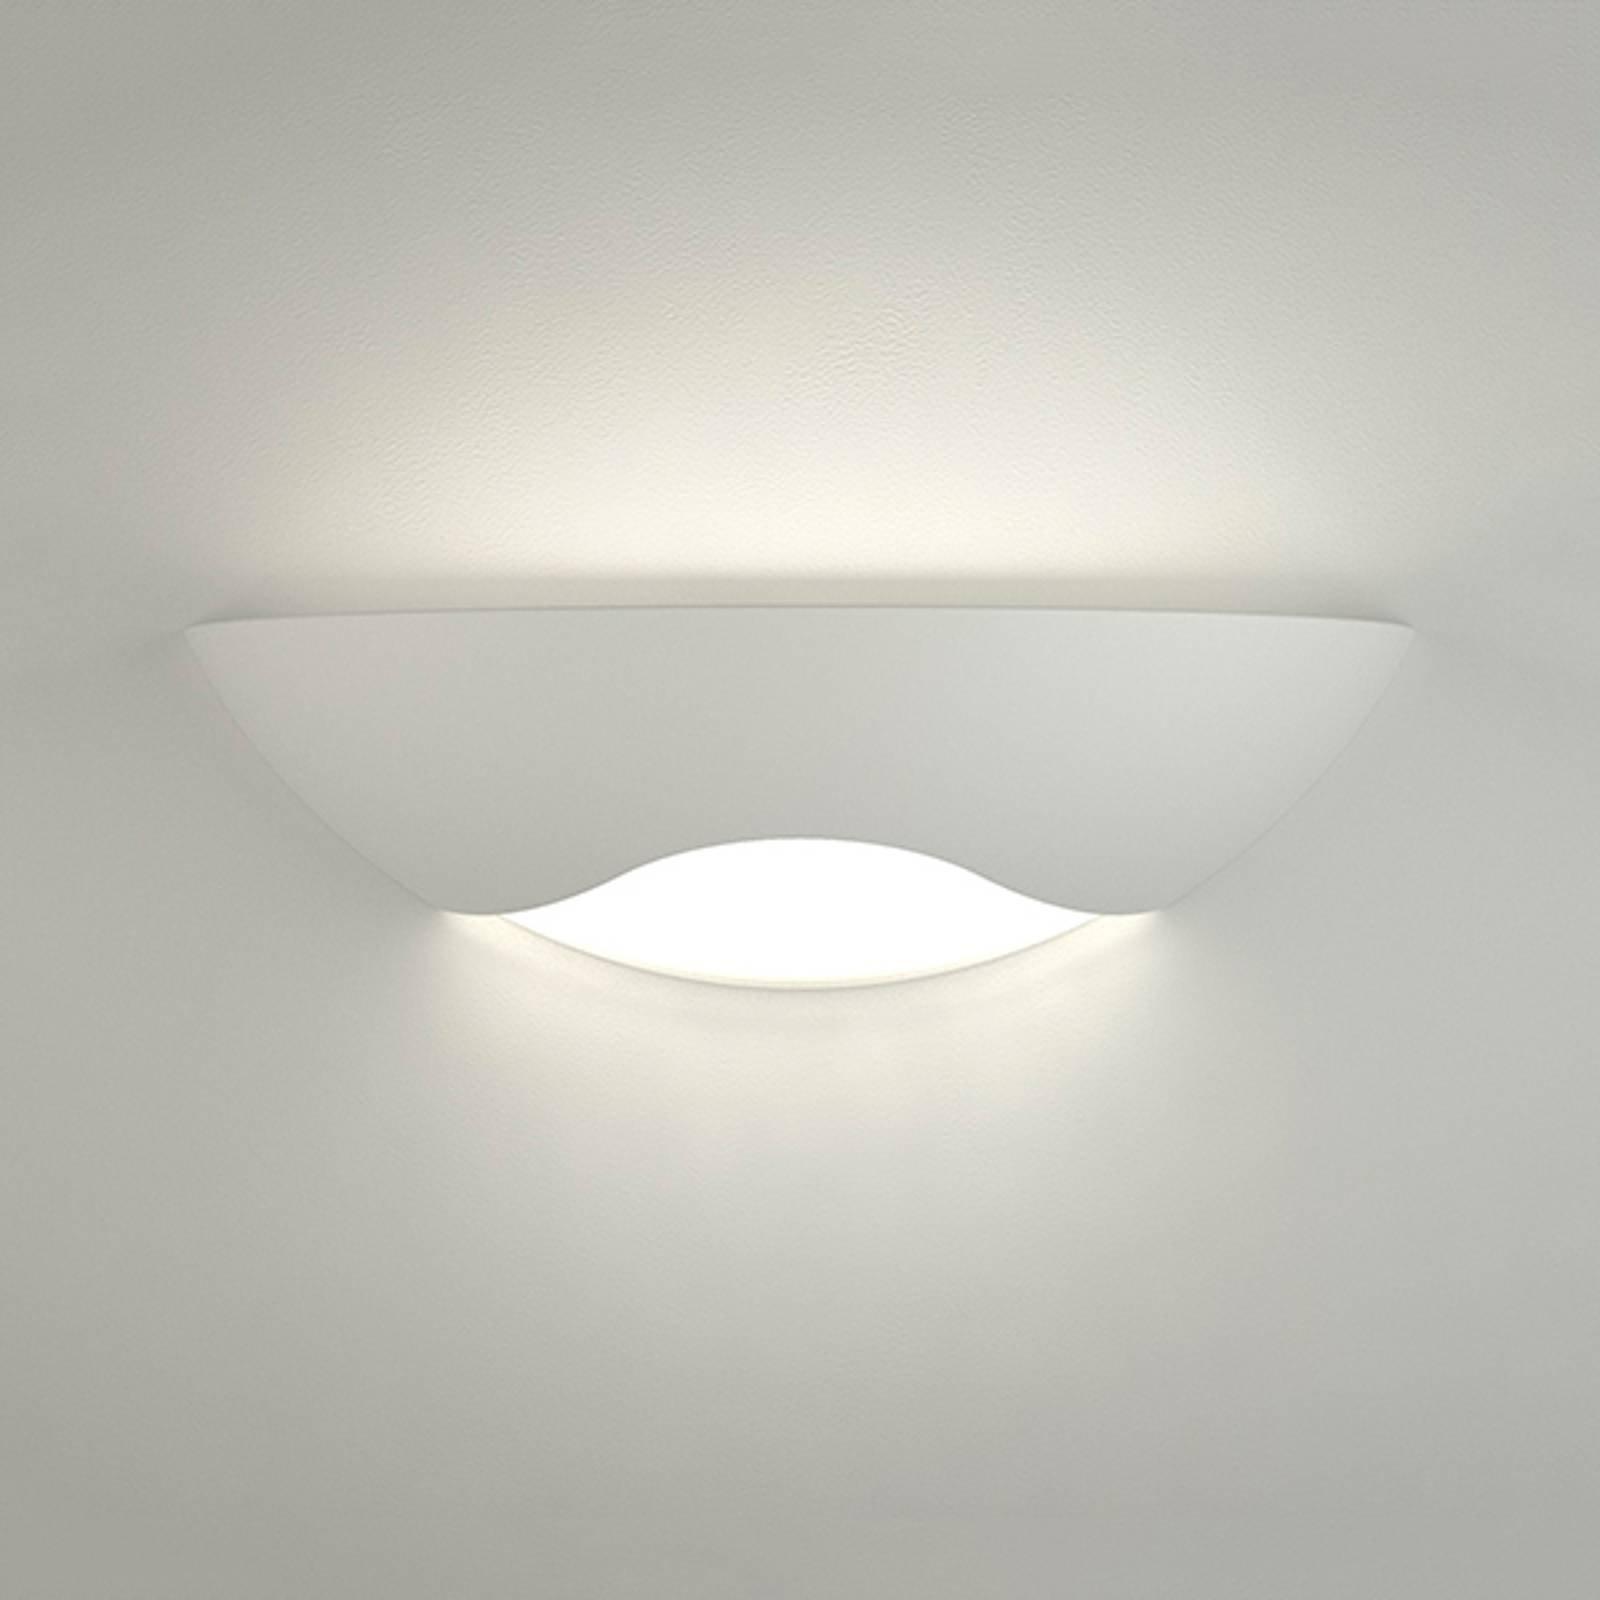 Velformet LED-vegglampe Ambra i keramikk